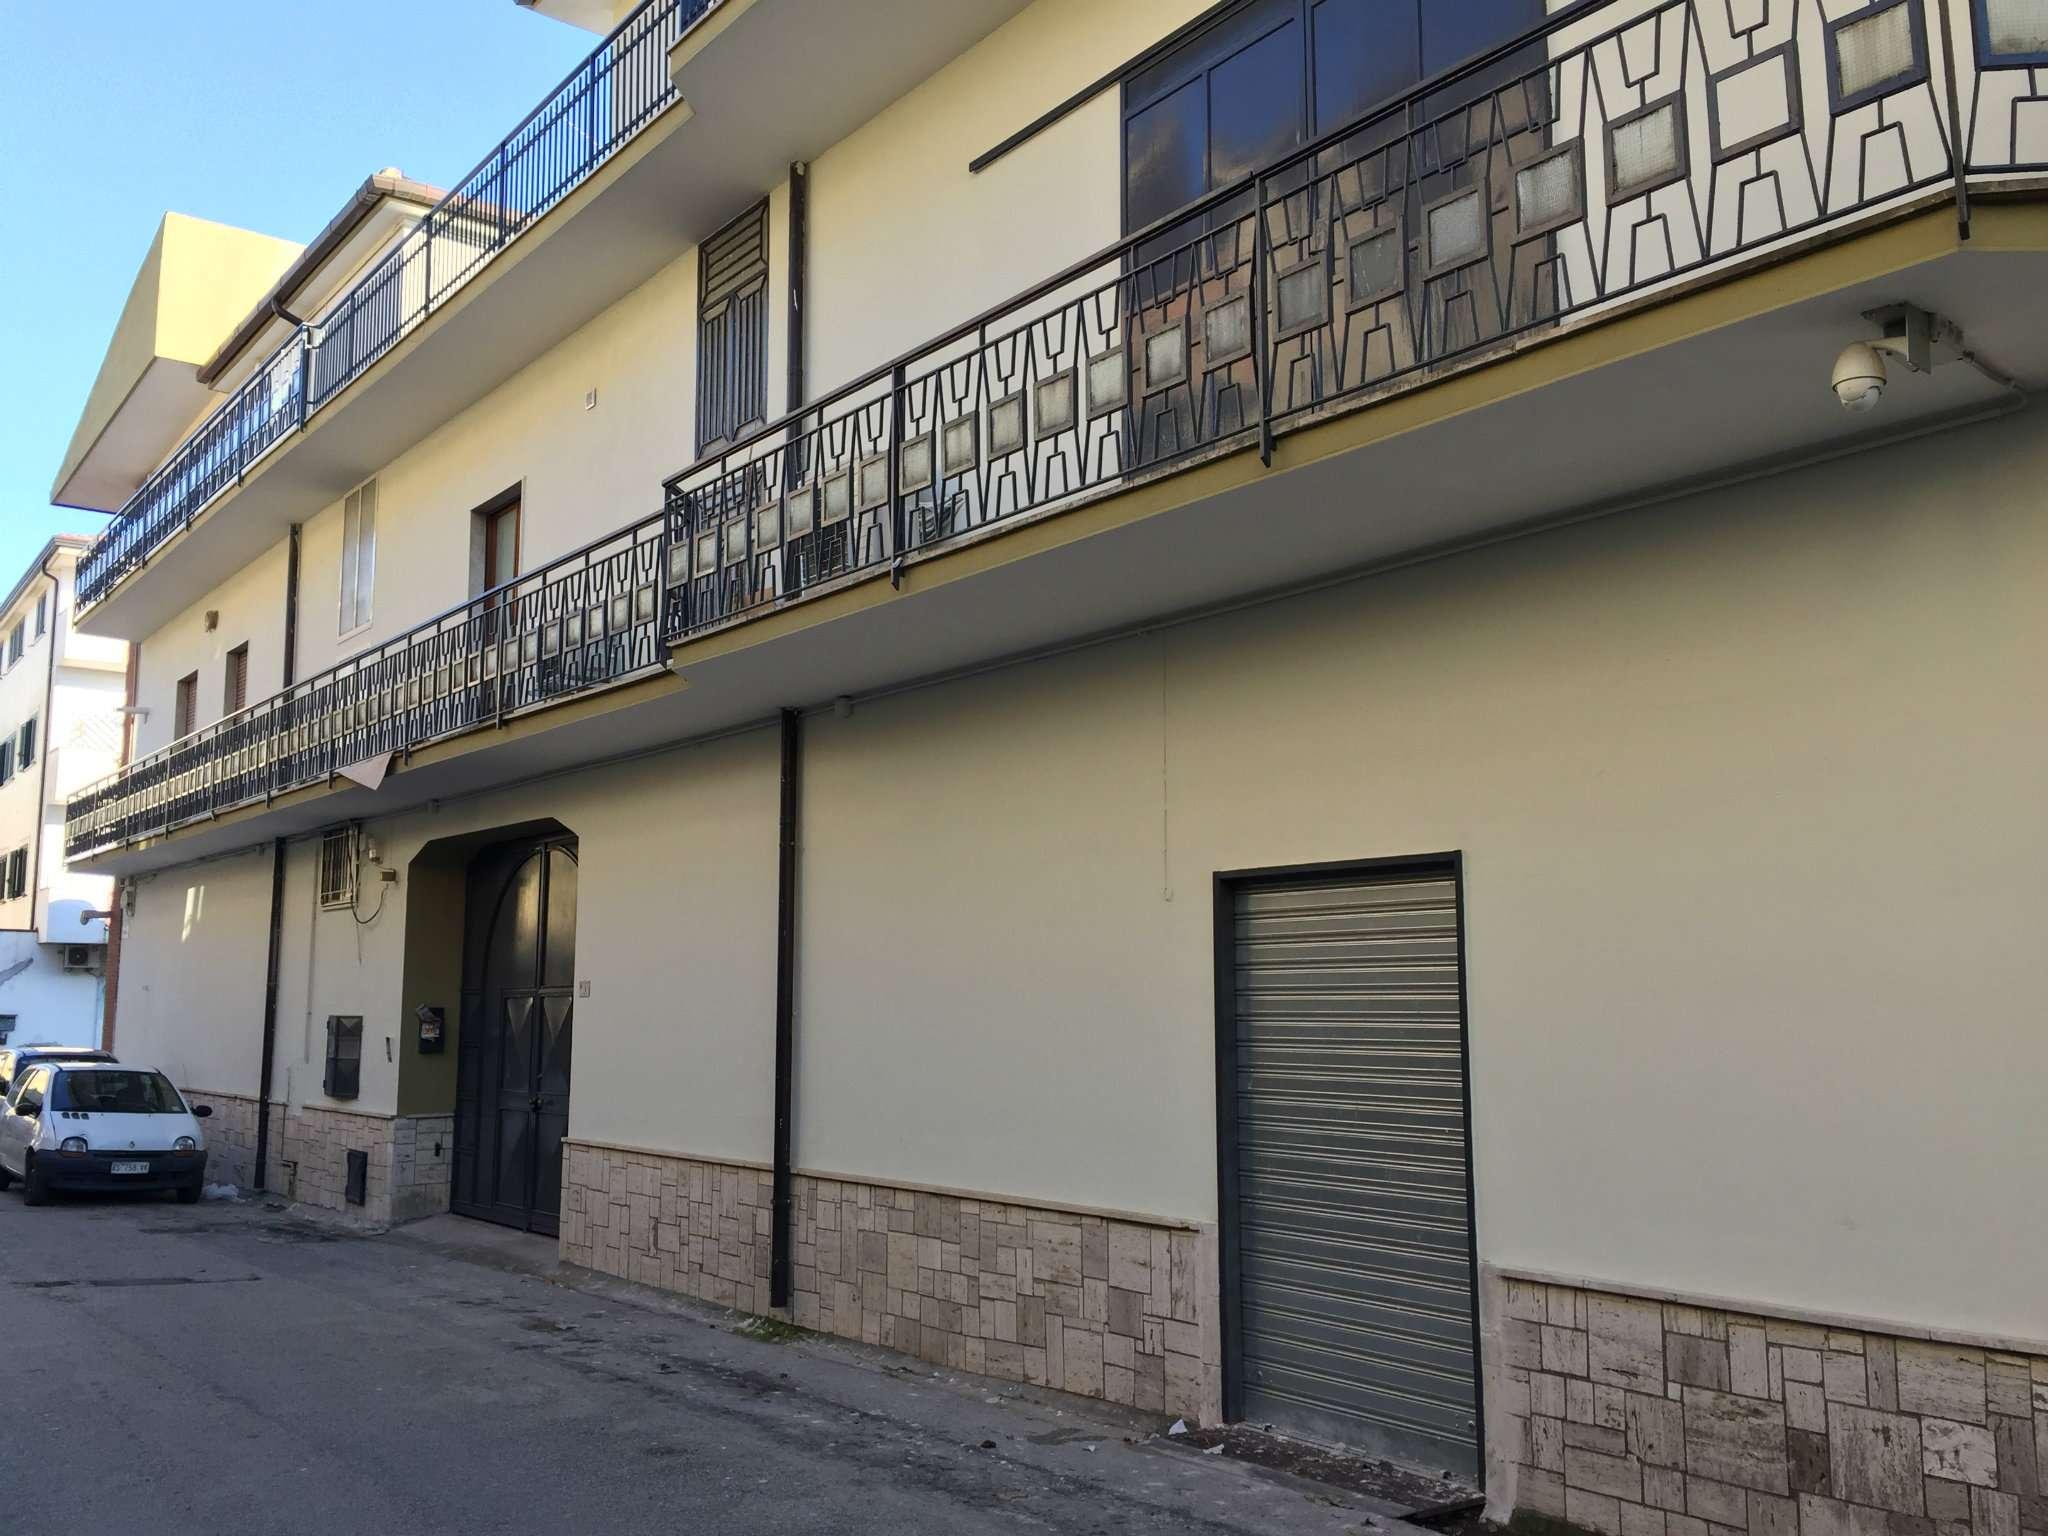 Soluzione Indipendente in vendita a Marcianise, 20 locali, Trattative riservate | CambioCasa.it